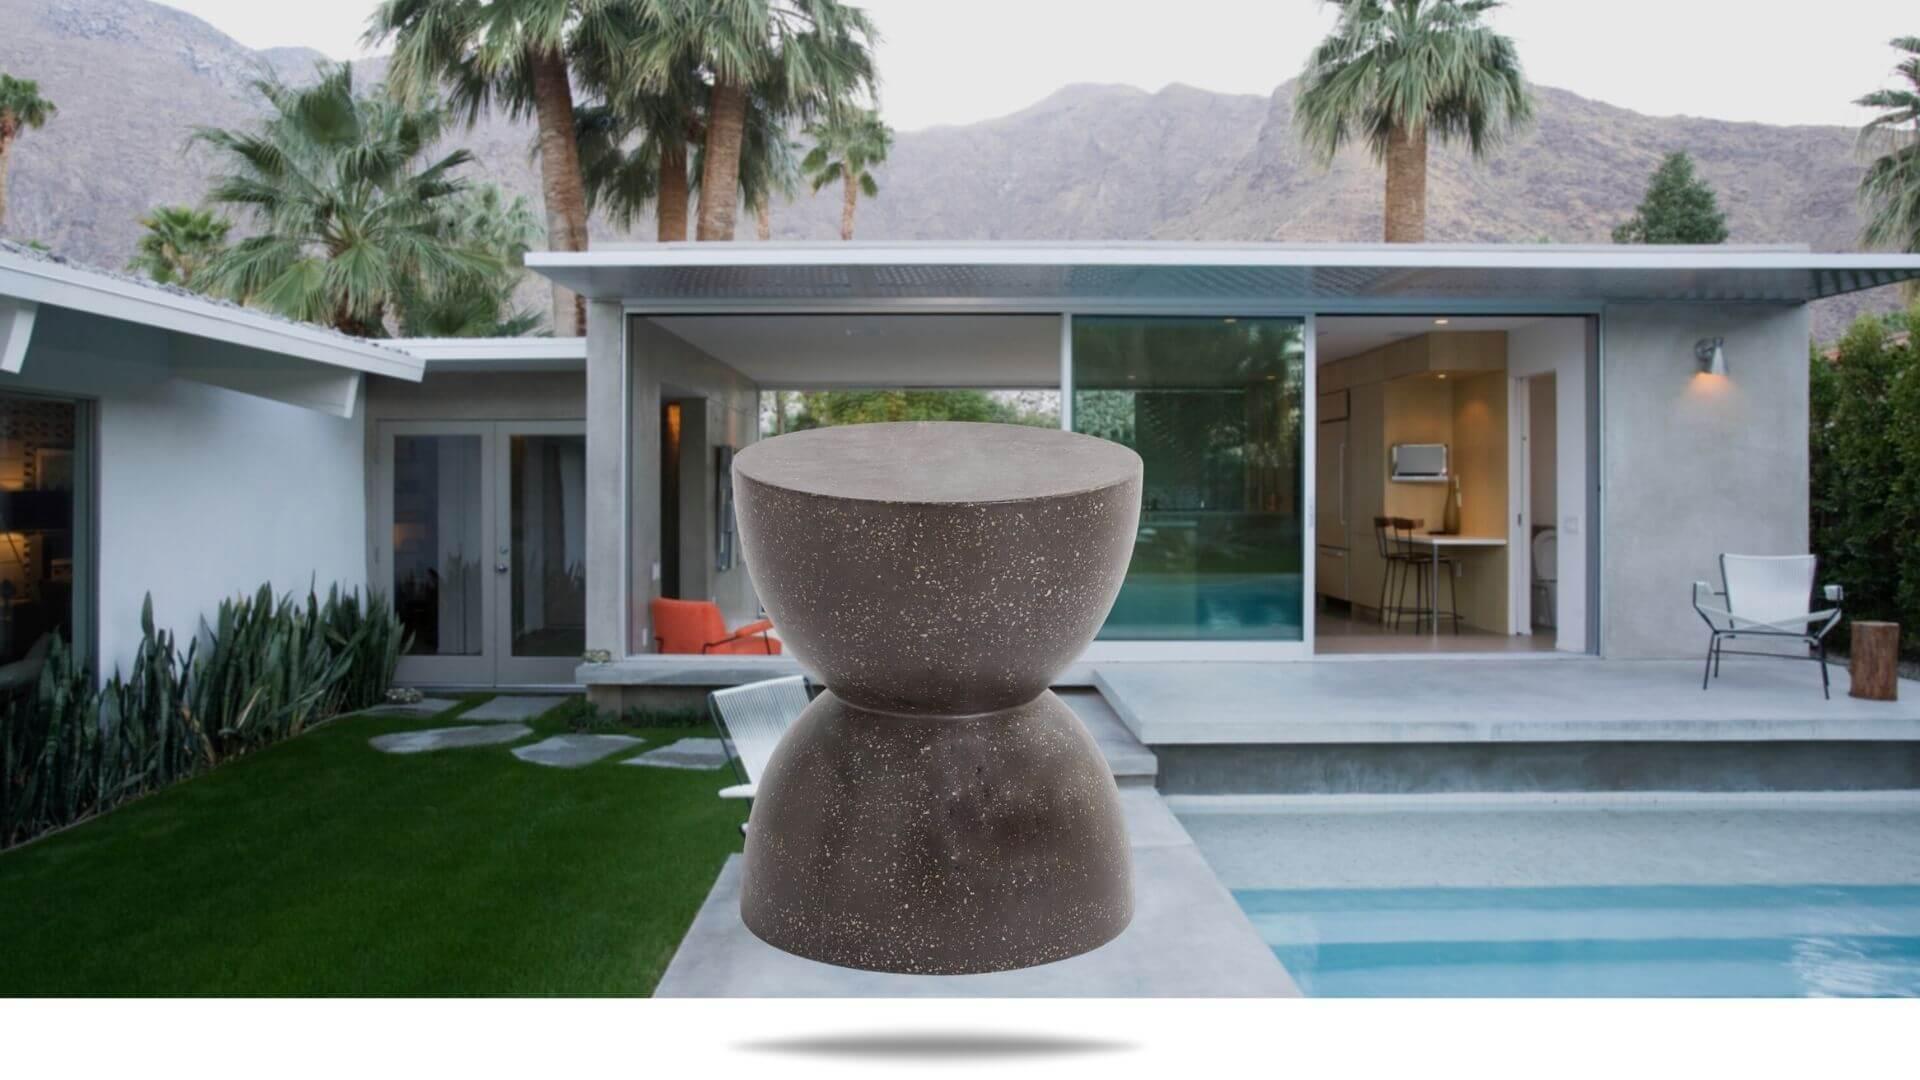 terrazzo-stool-drew-garden table